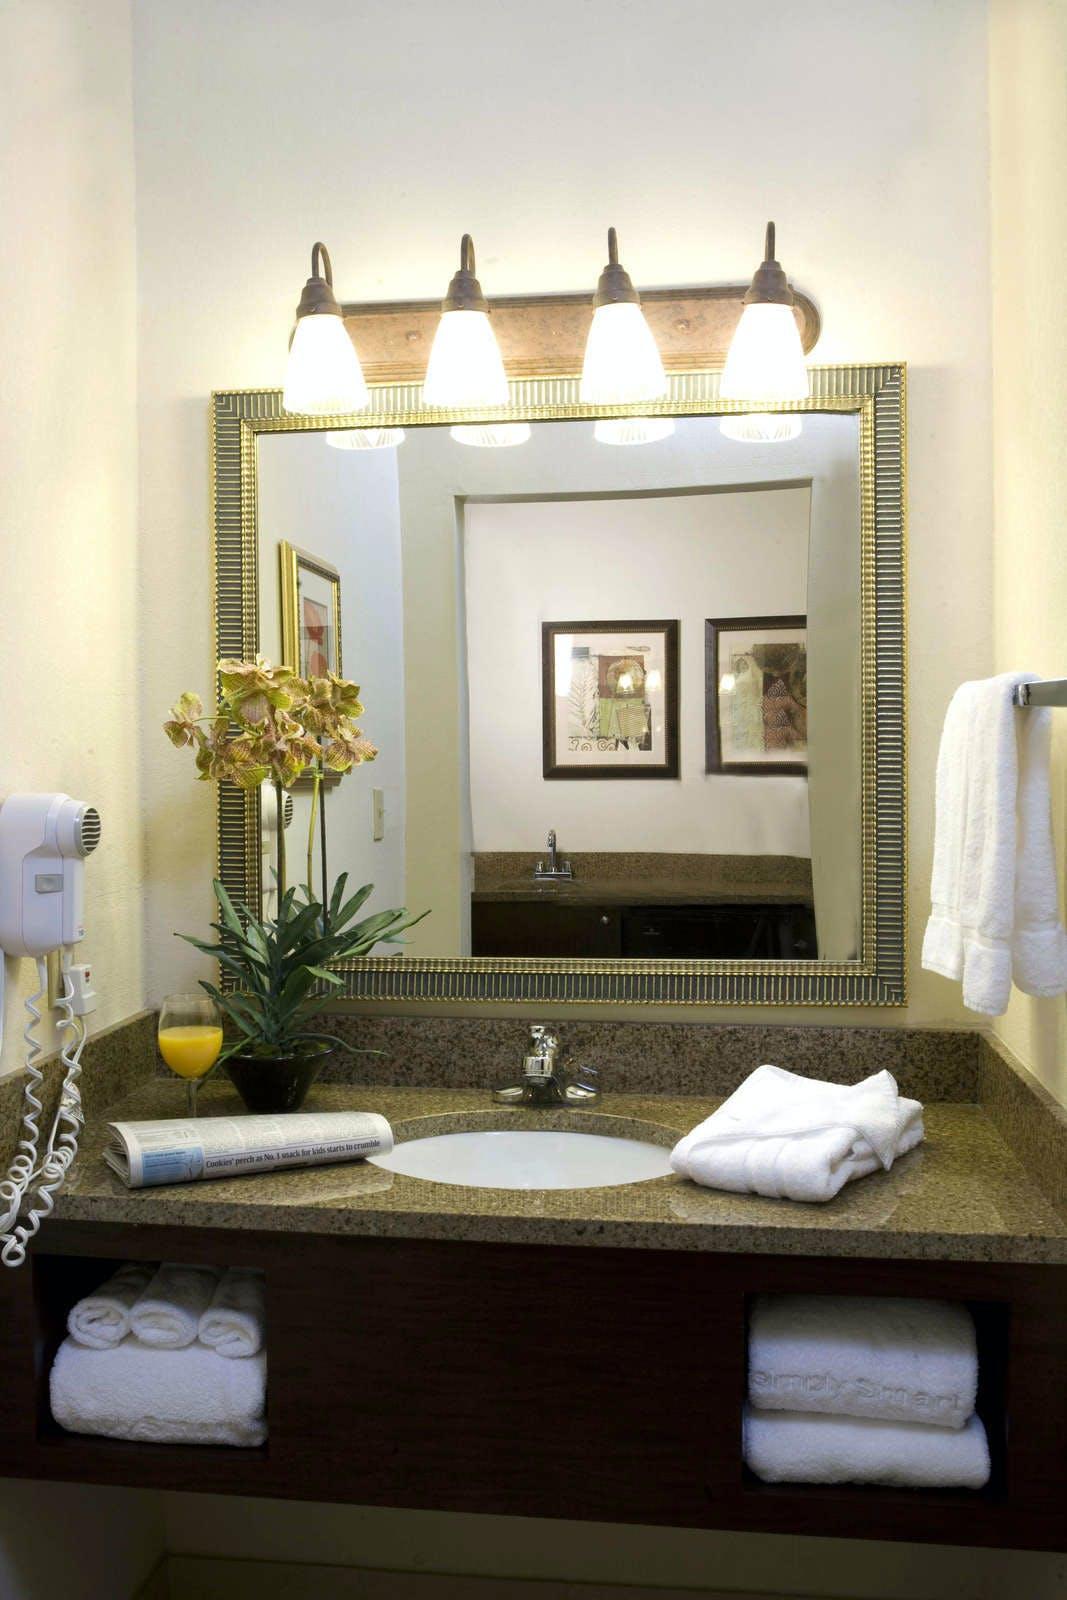 Holiday Inn Express Hotel & Suites Emory University